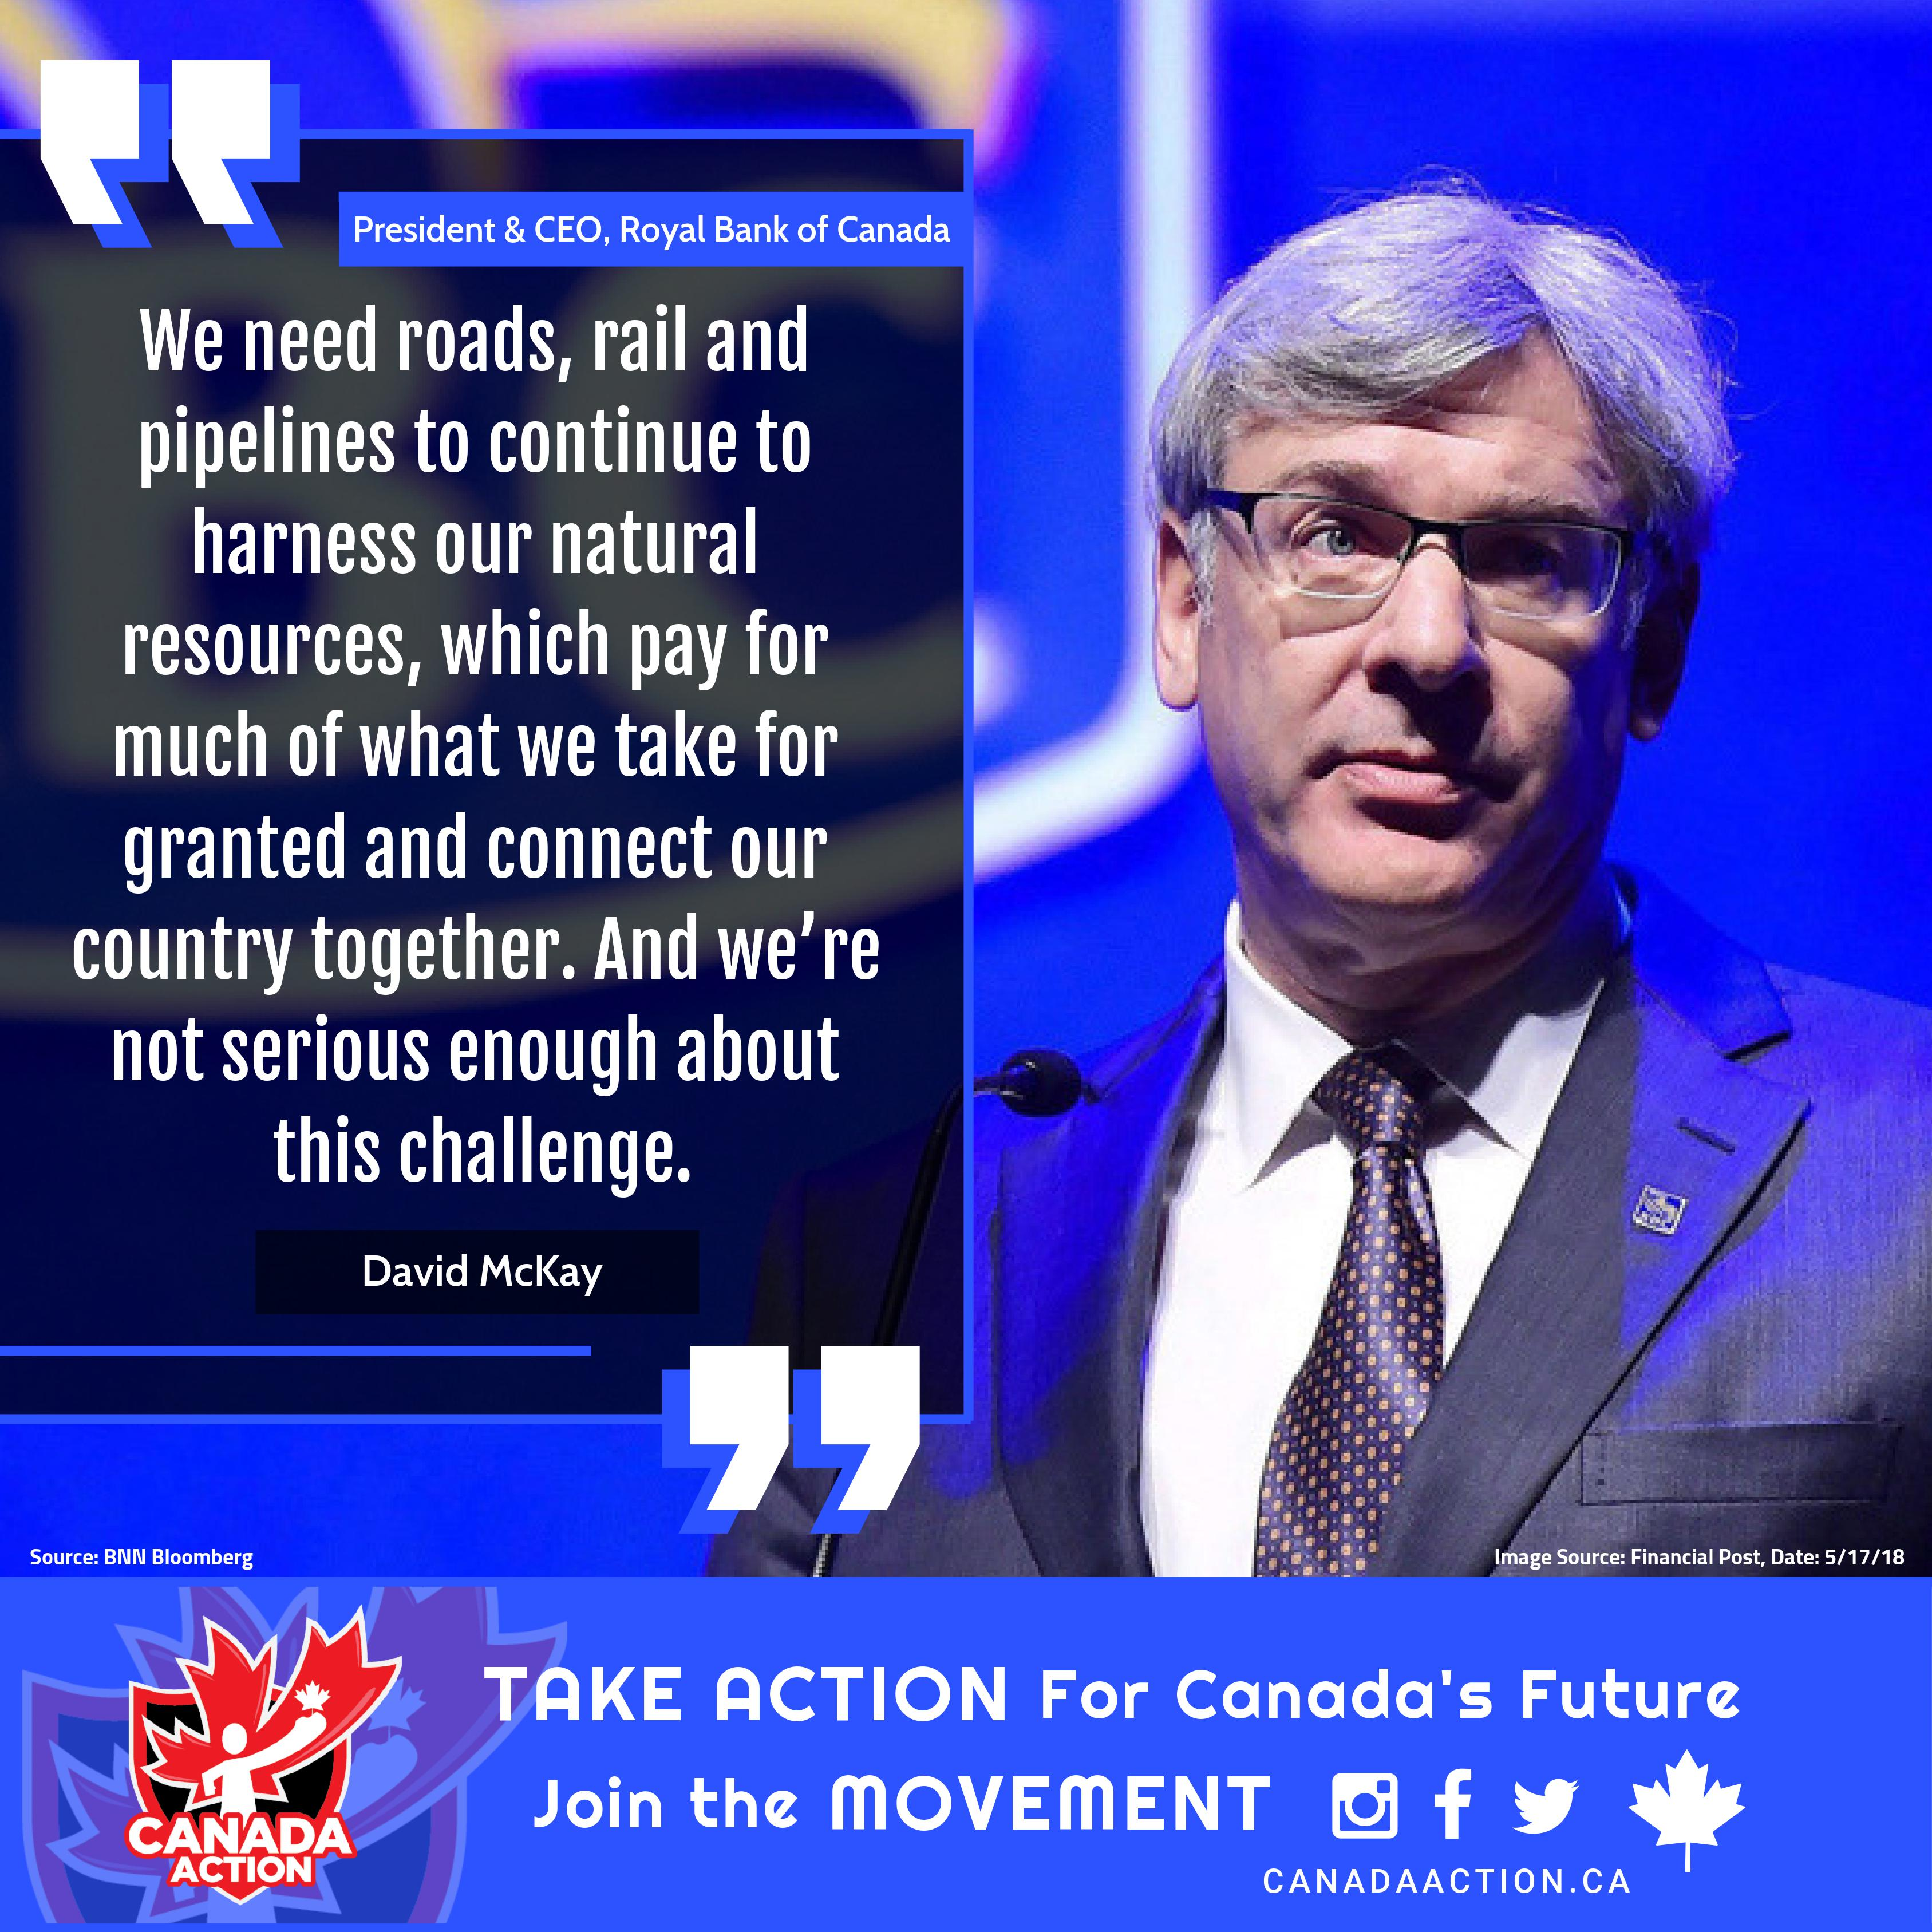 Dave McKay - Canada needs energy infrastructure to prosper, unity